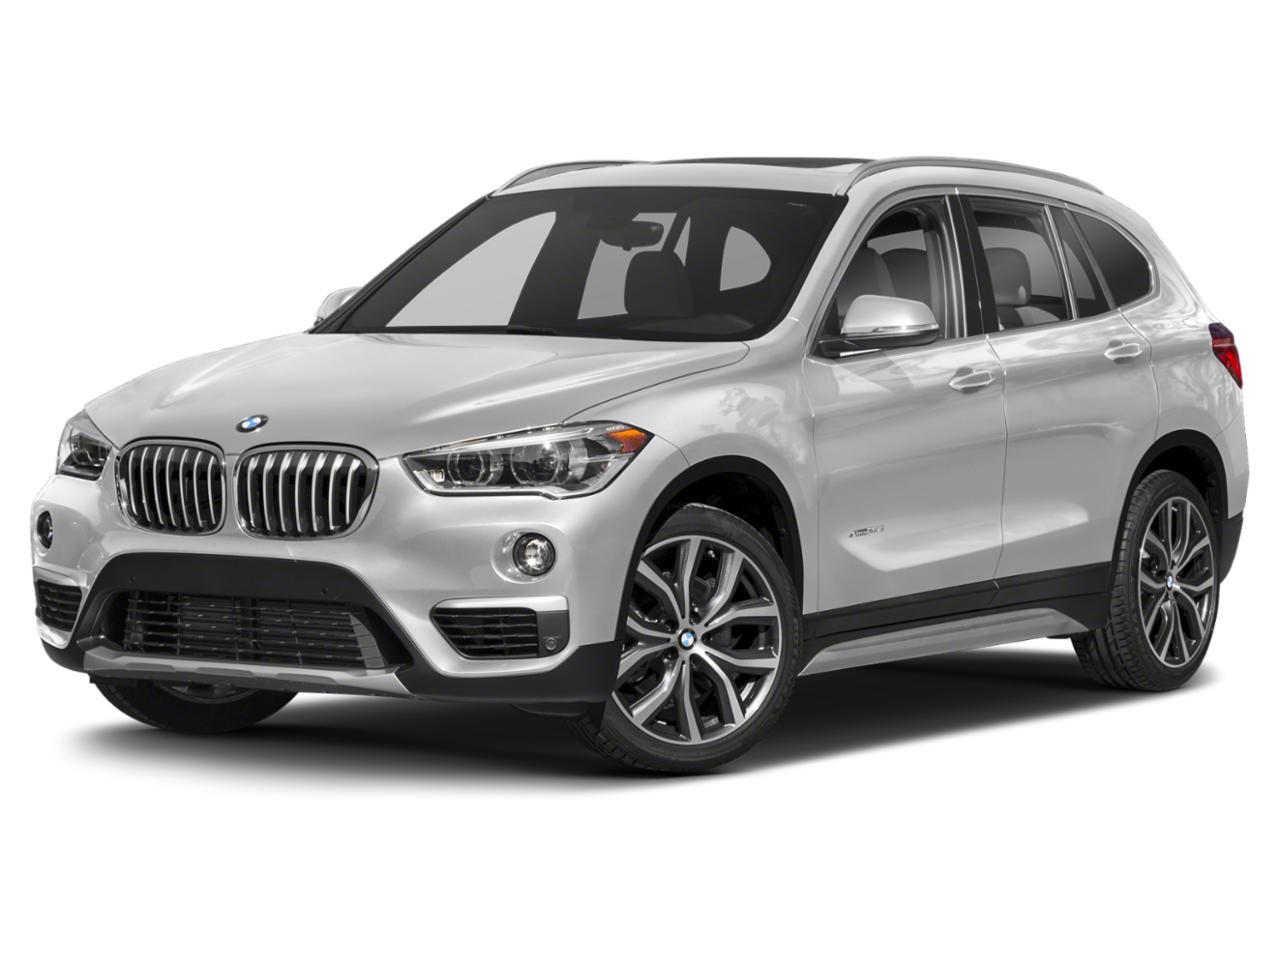 2018 BMW X1 xDrive28i Vehicle Photo in Oak Lawn, IL 60453-2517